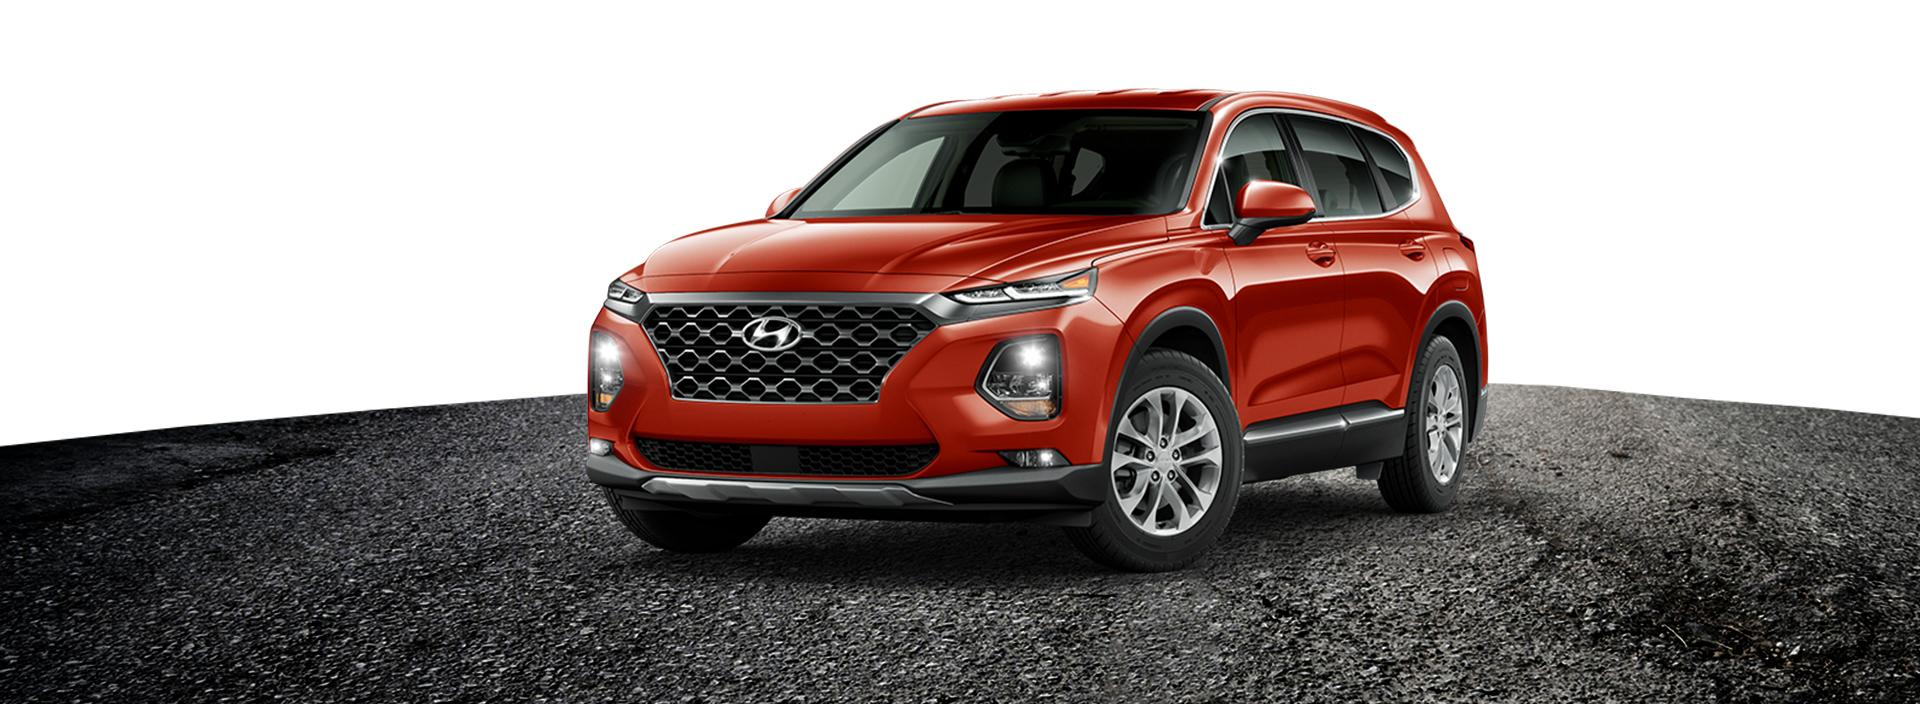 Red Hyundai Sante Fe